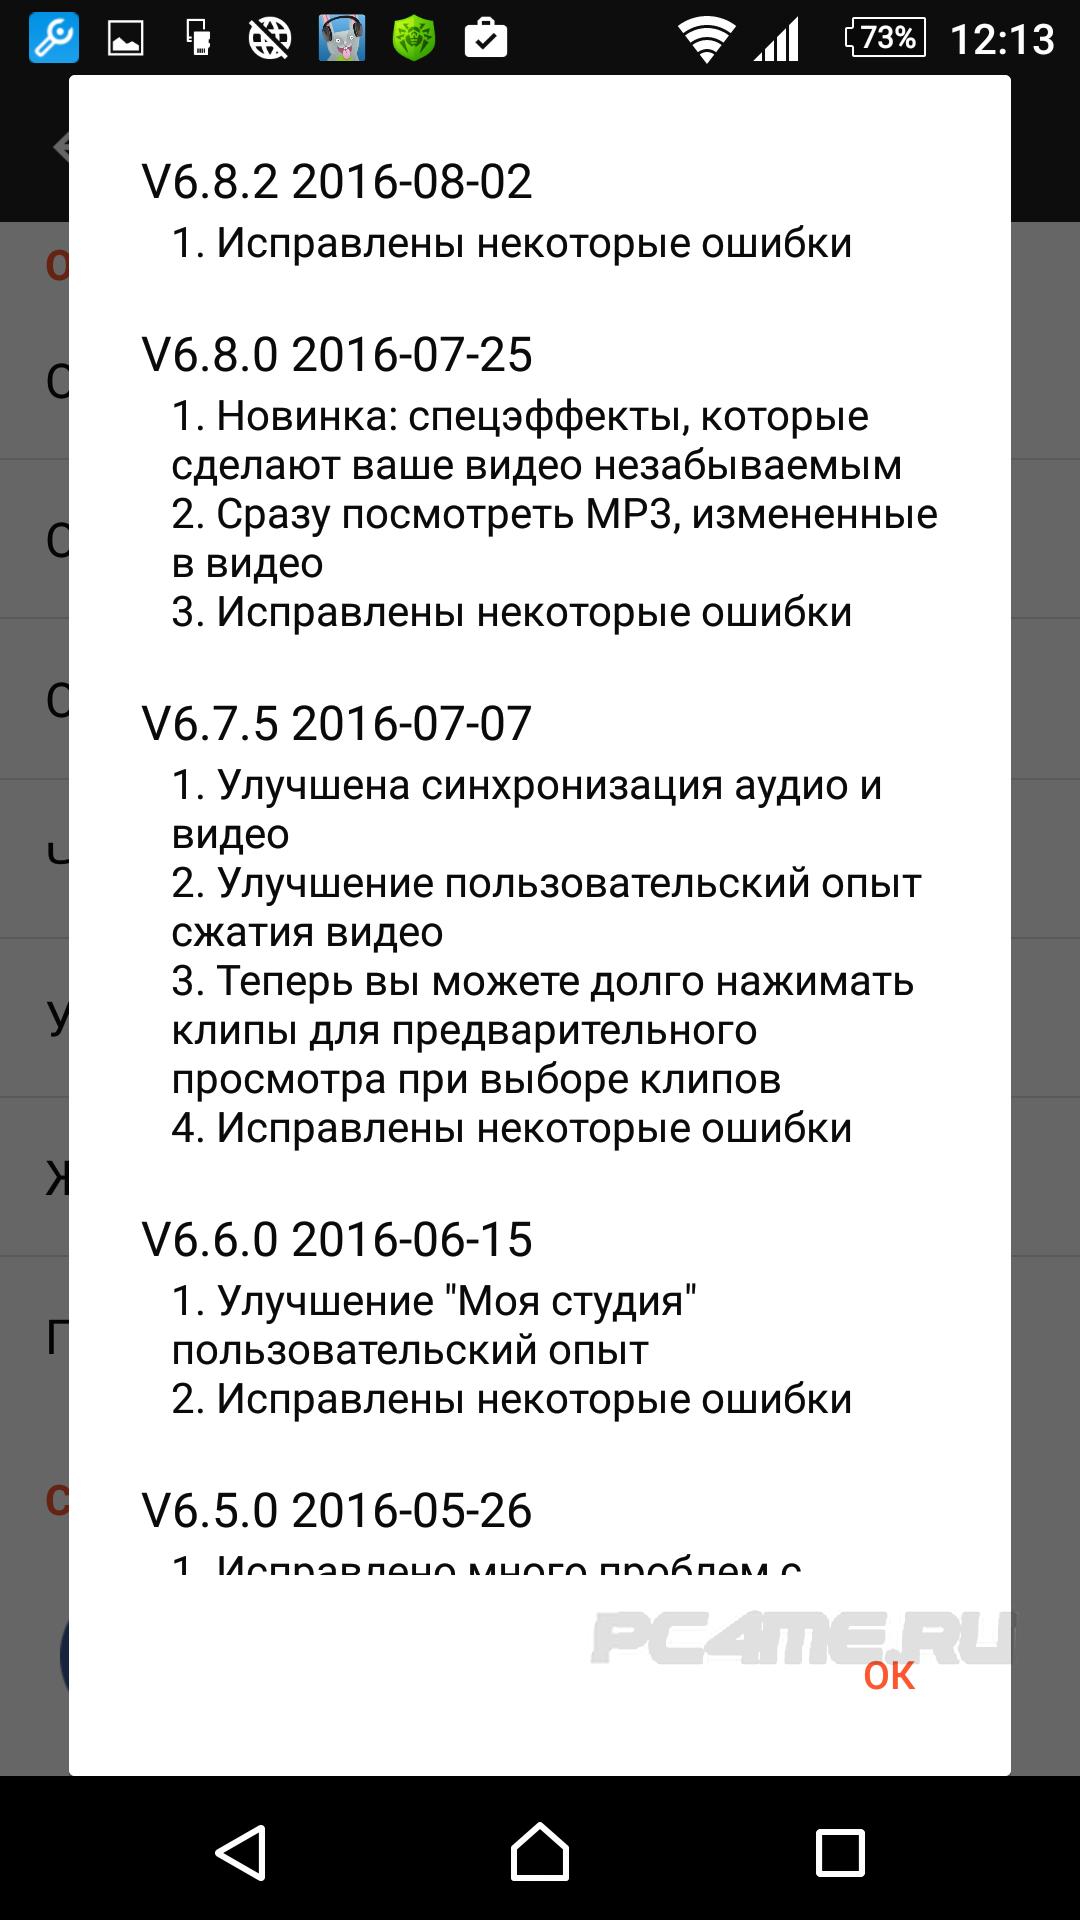 Screenshot_2016-08-03-12-13-17